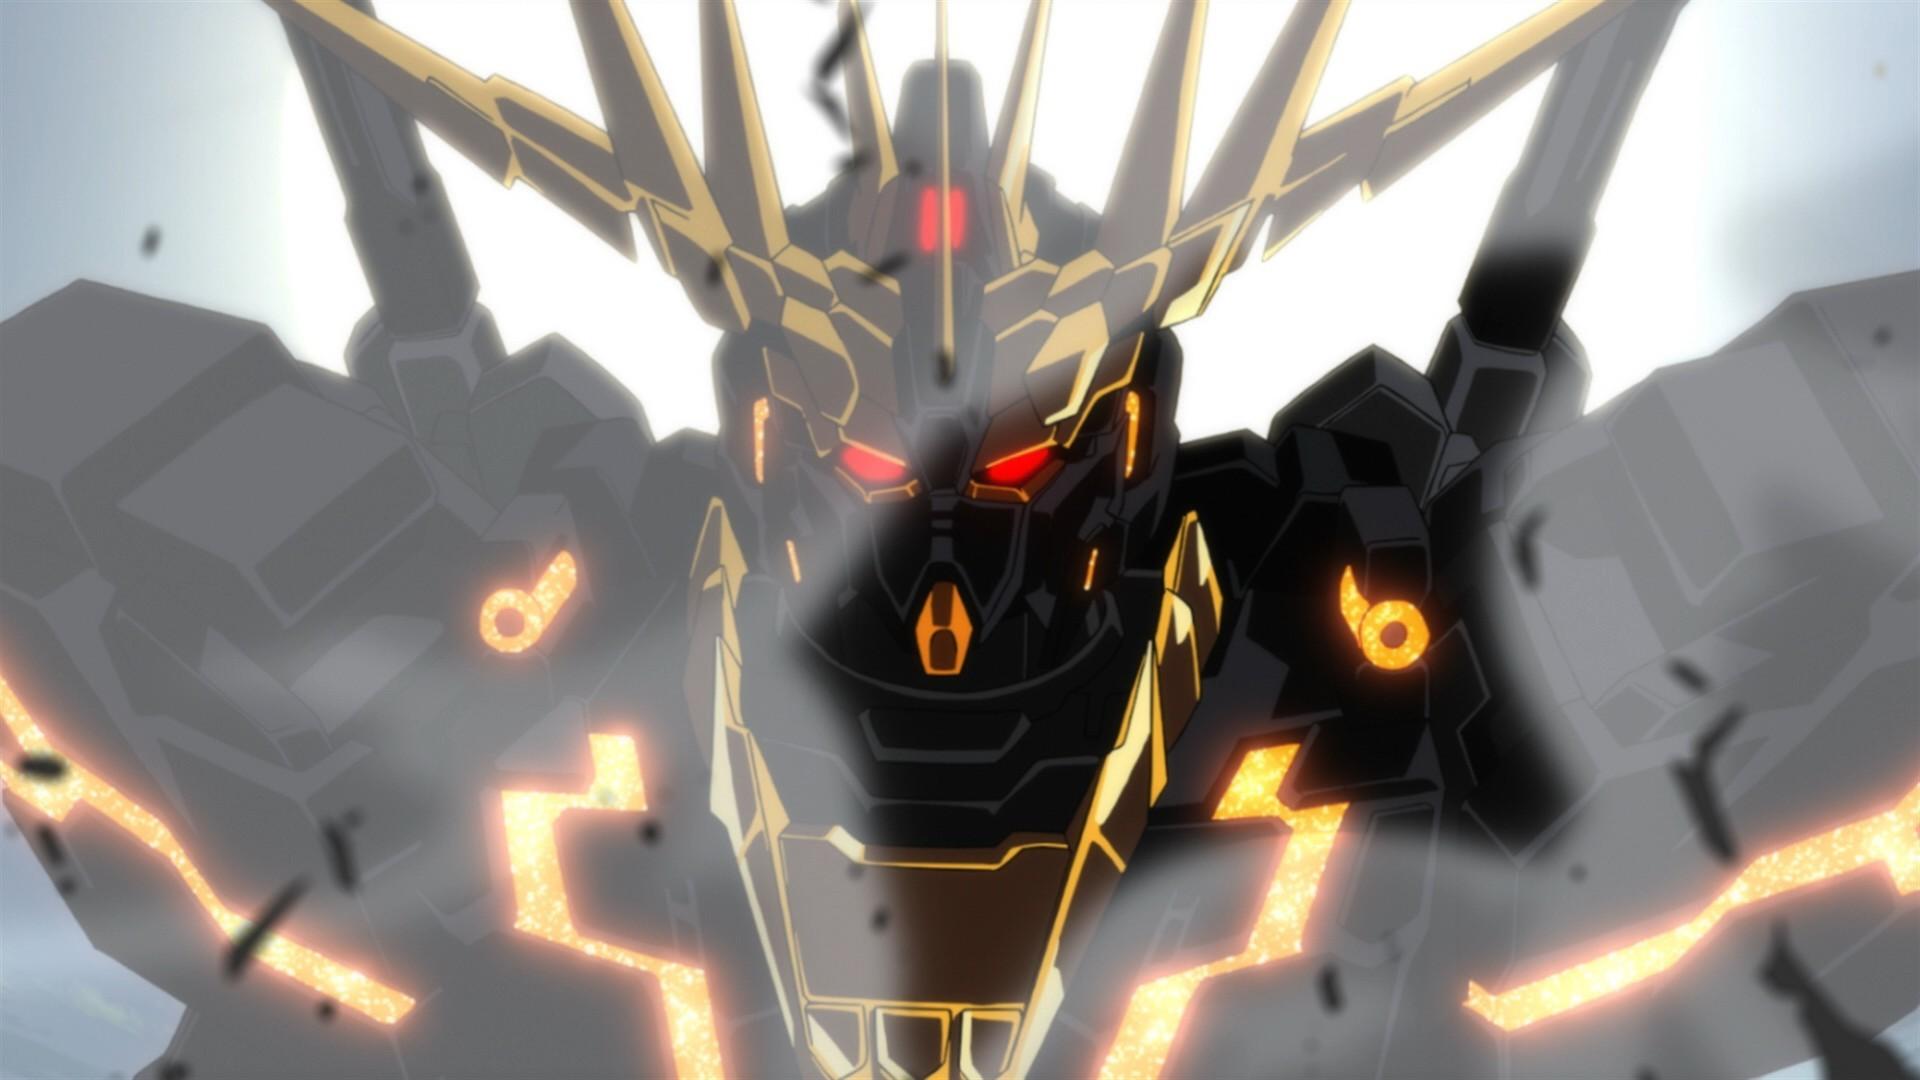 Gundam Hd Wallpaper Wallpapertag